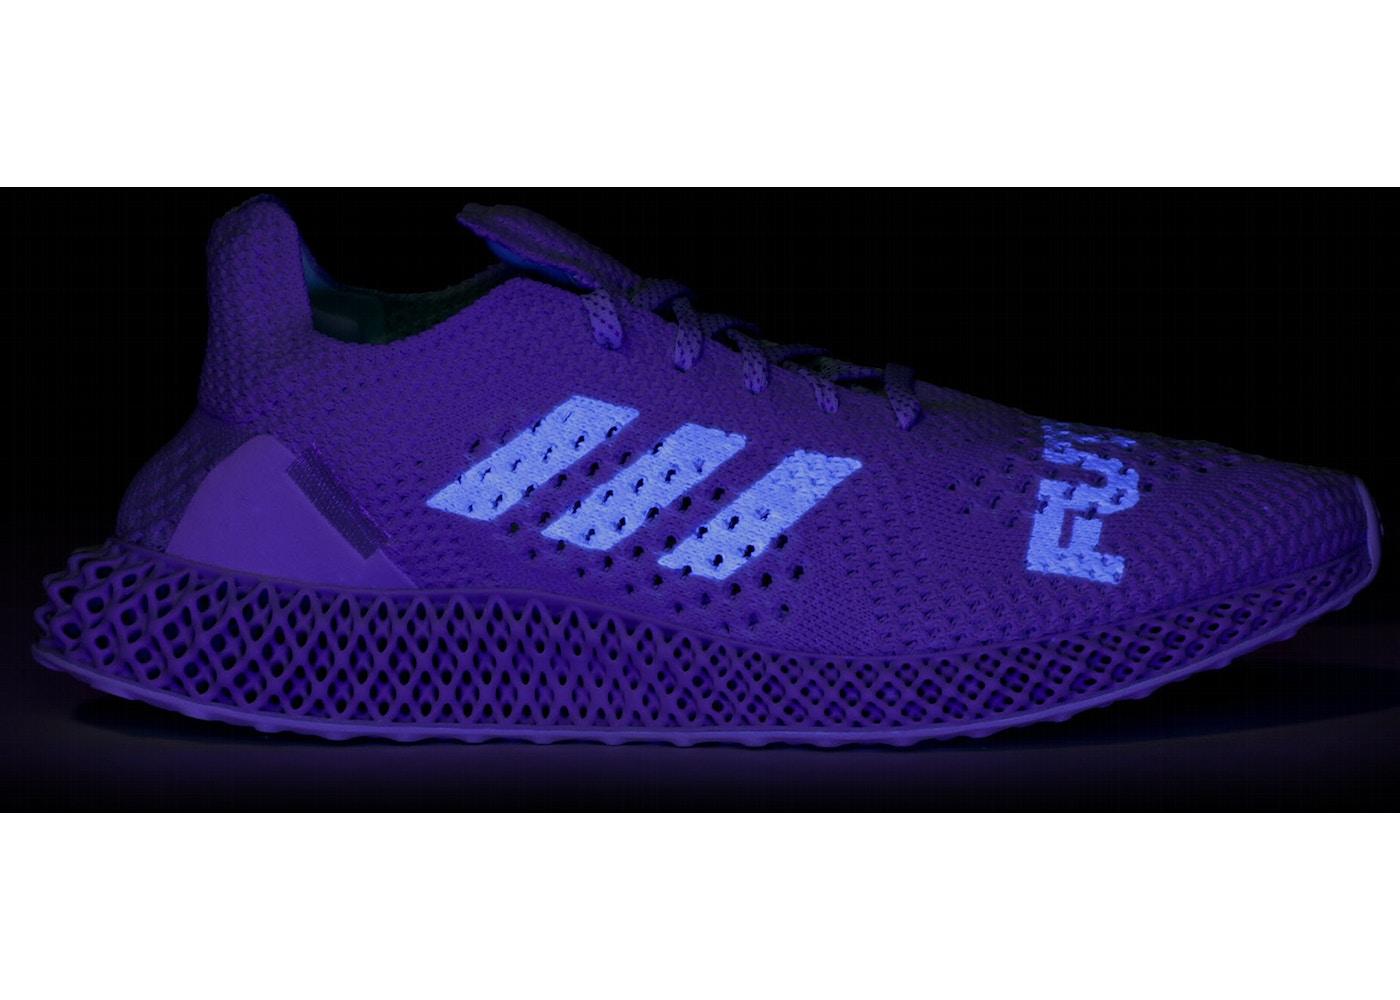 e1416358c11 adidas Other Shoes - Highest Bid